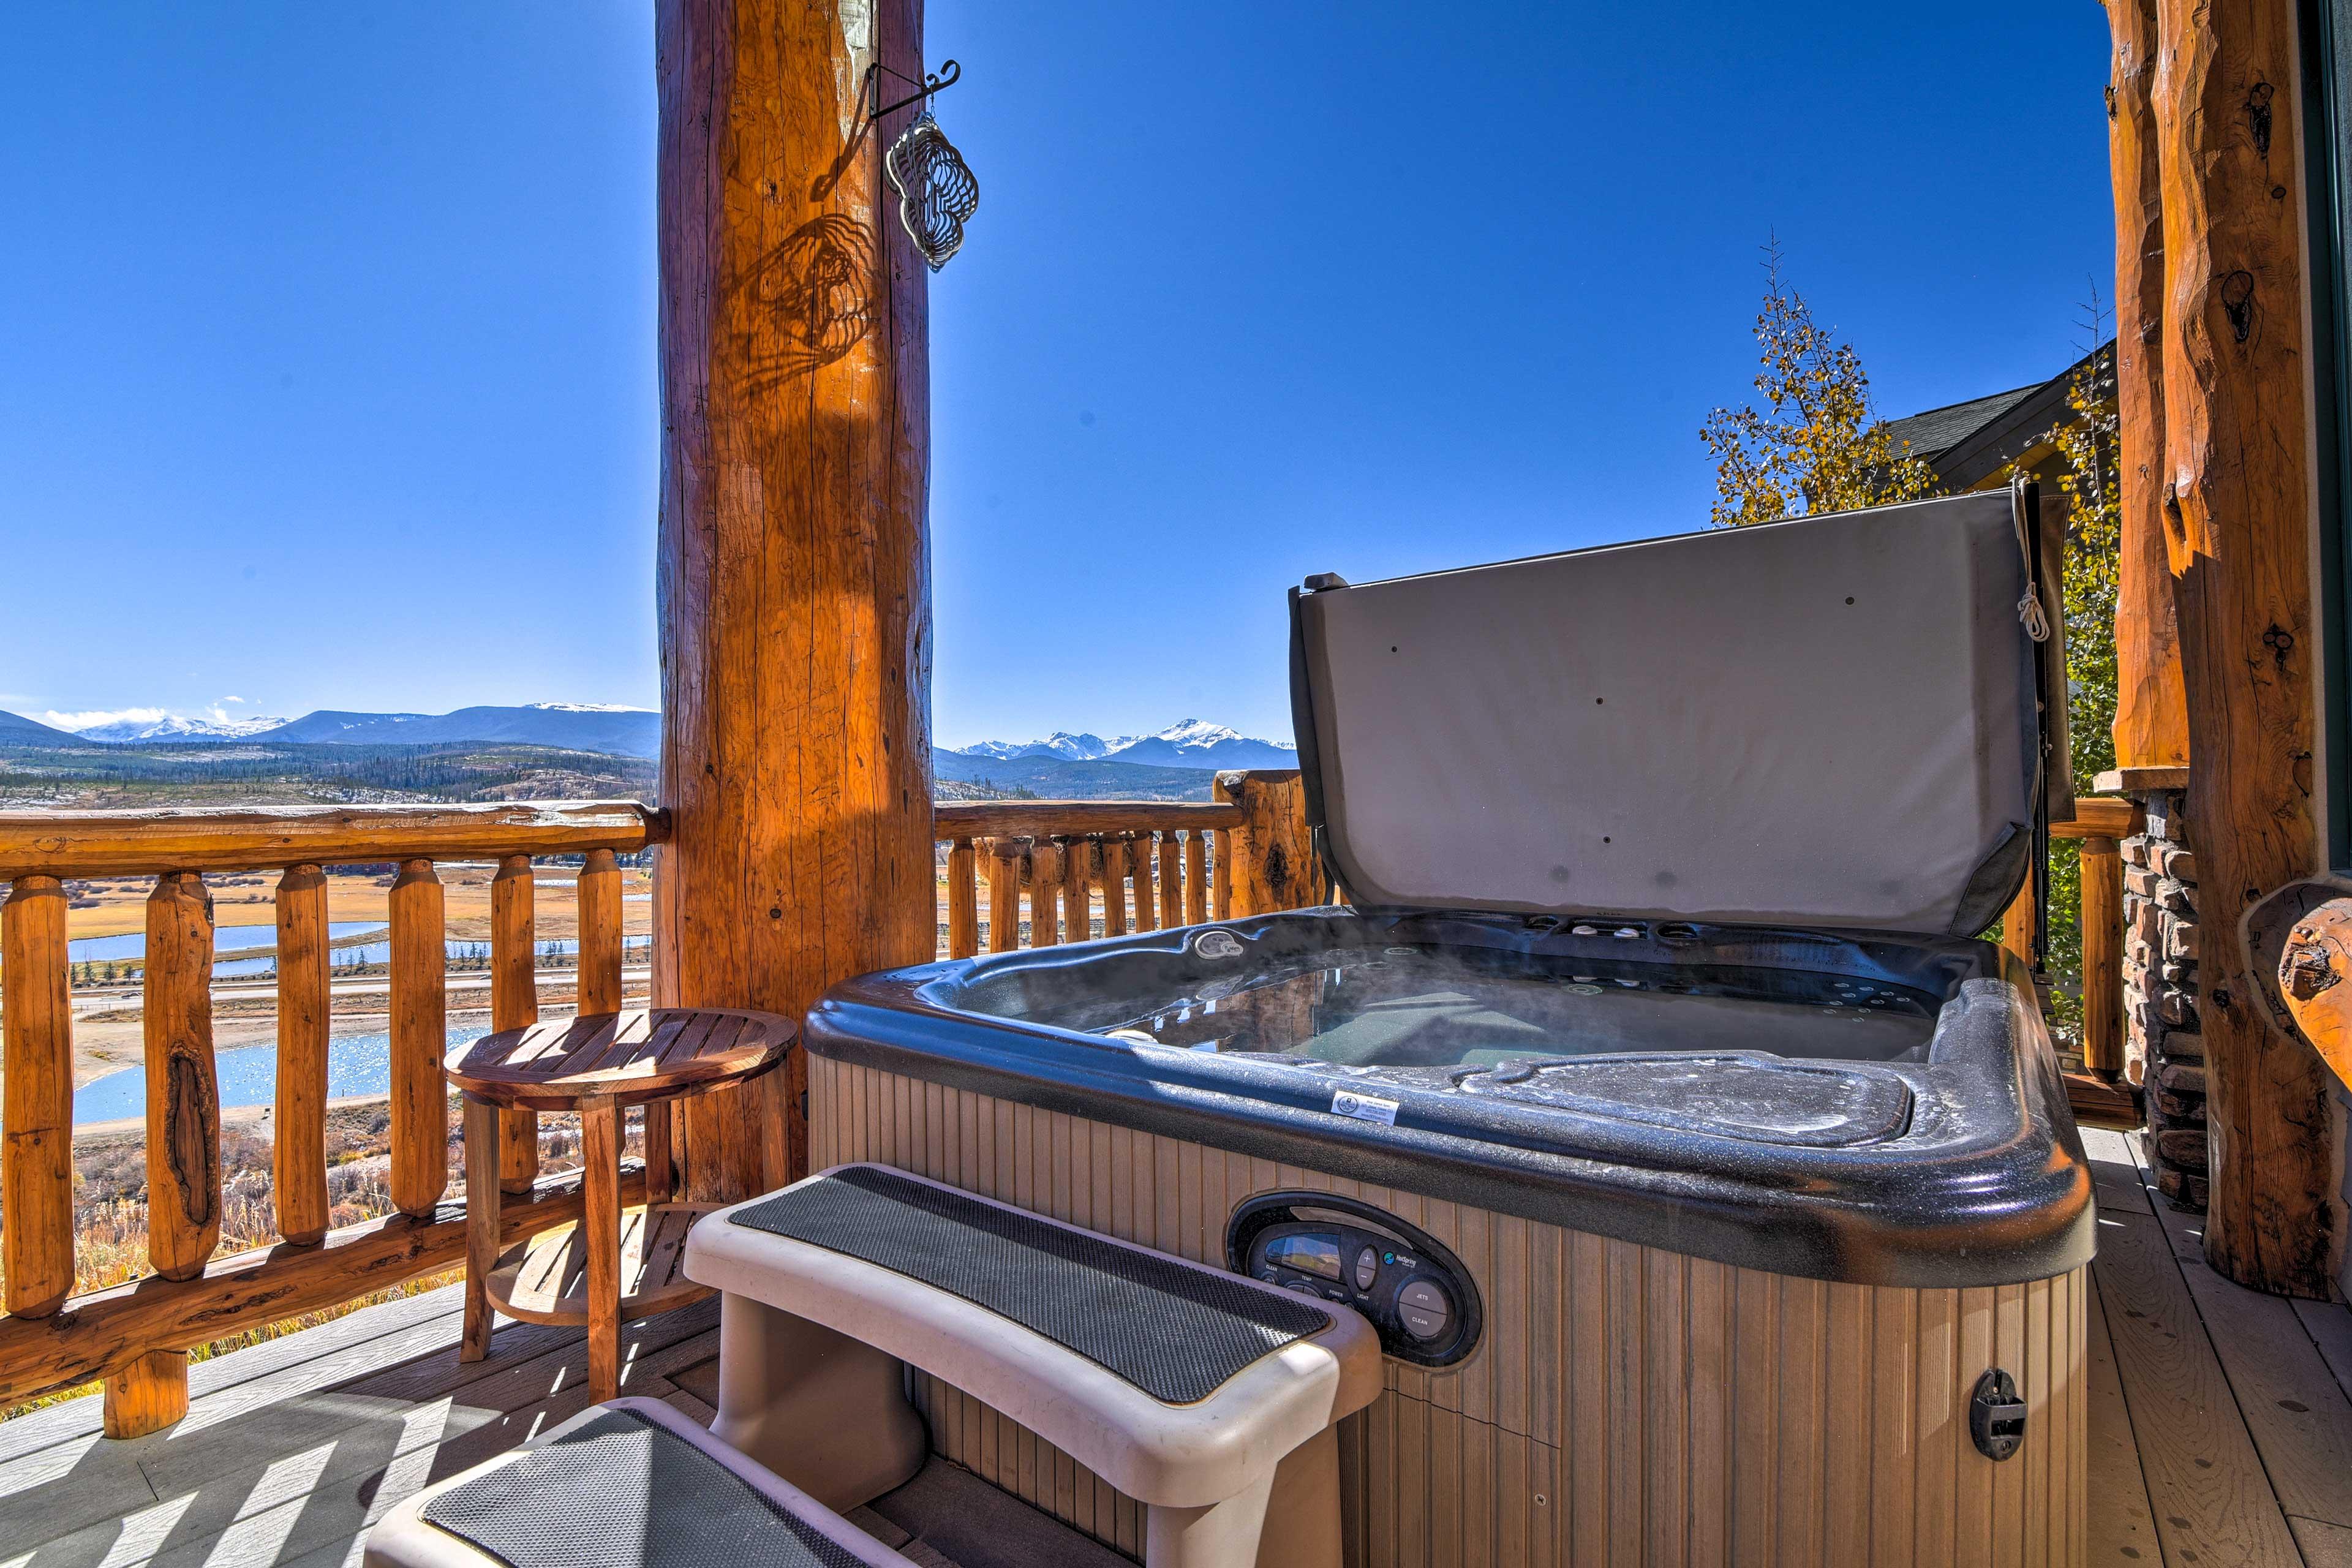 Private Hot Tub | Downtown, River & Ski Slope Views